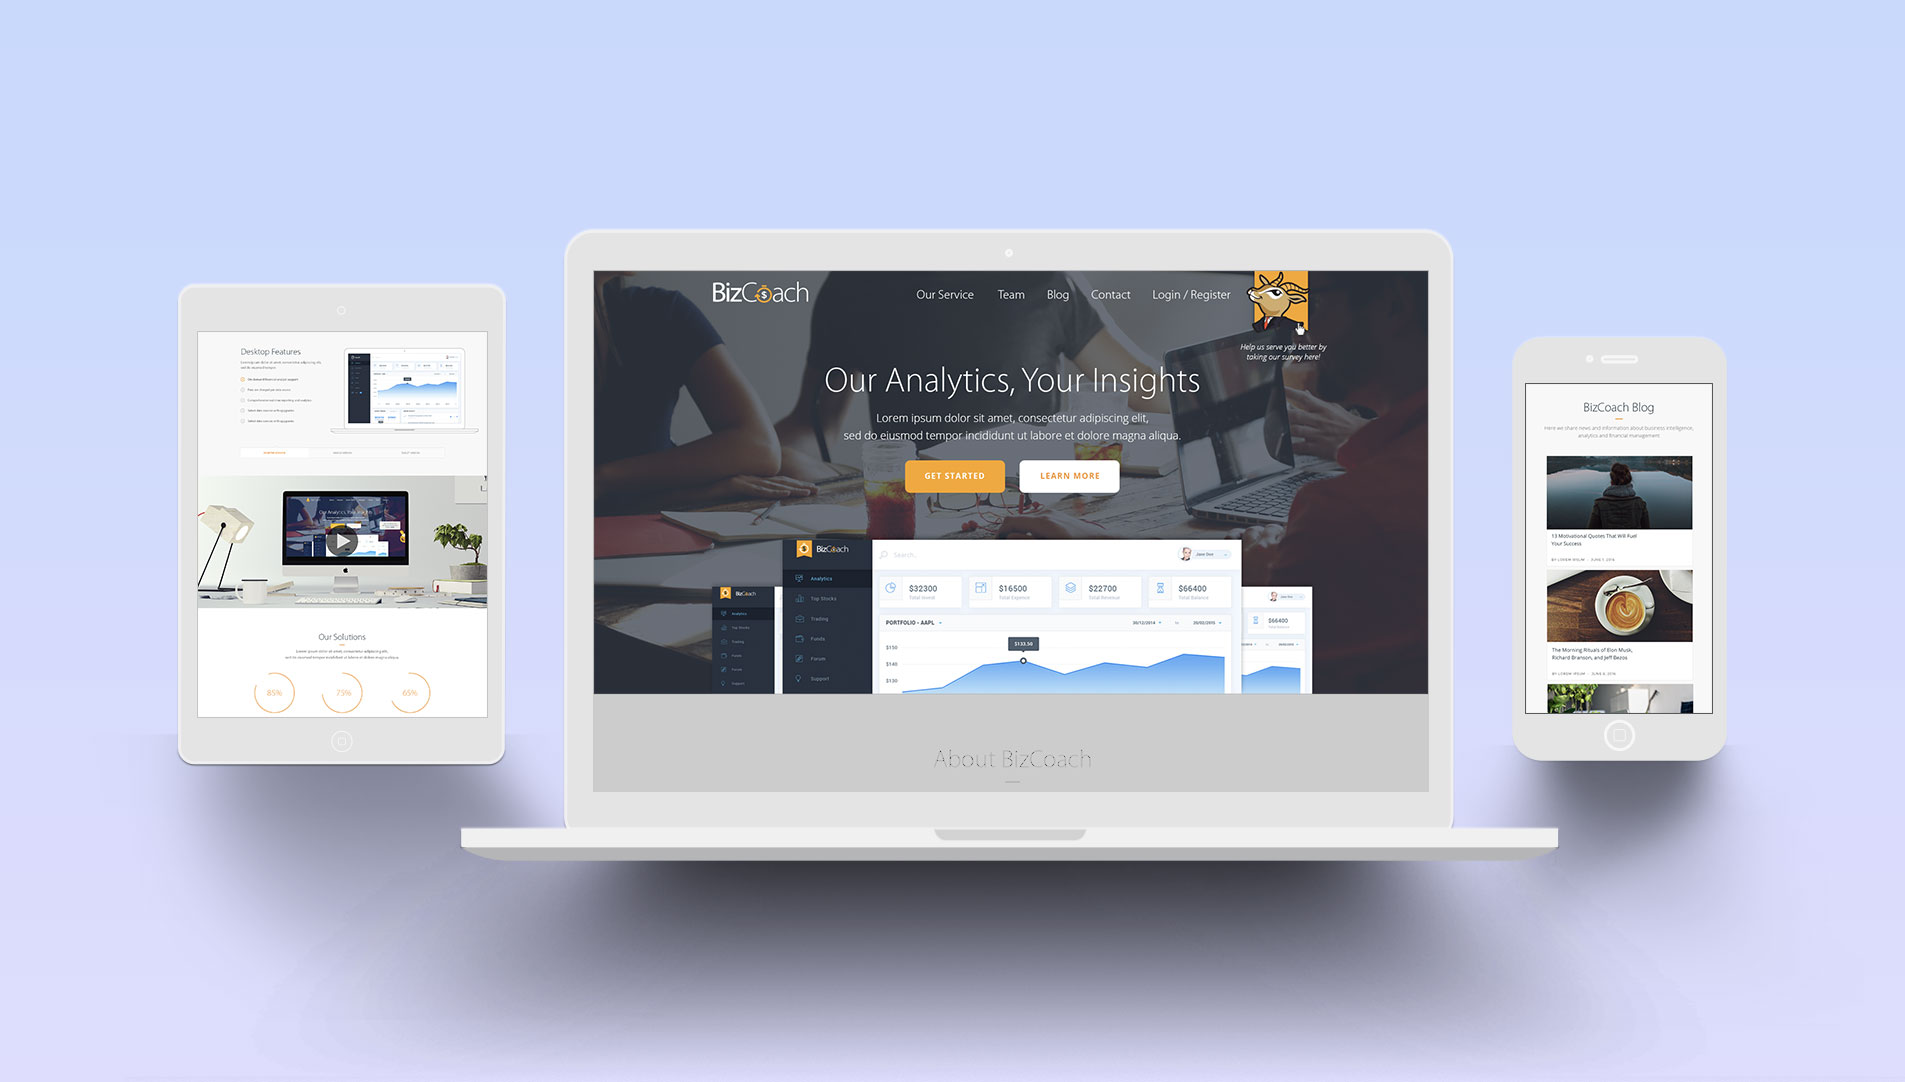 web design hk bizcoach slideshow 00